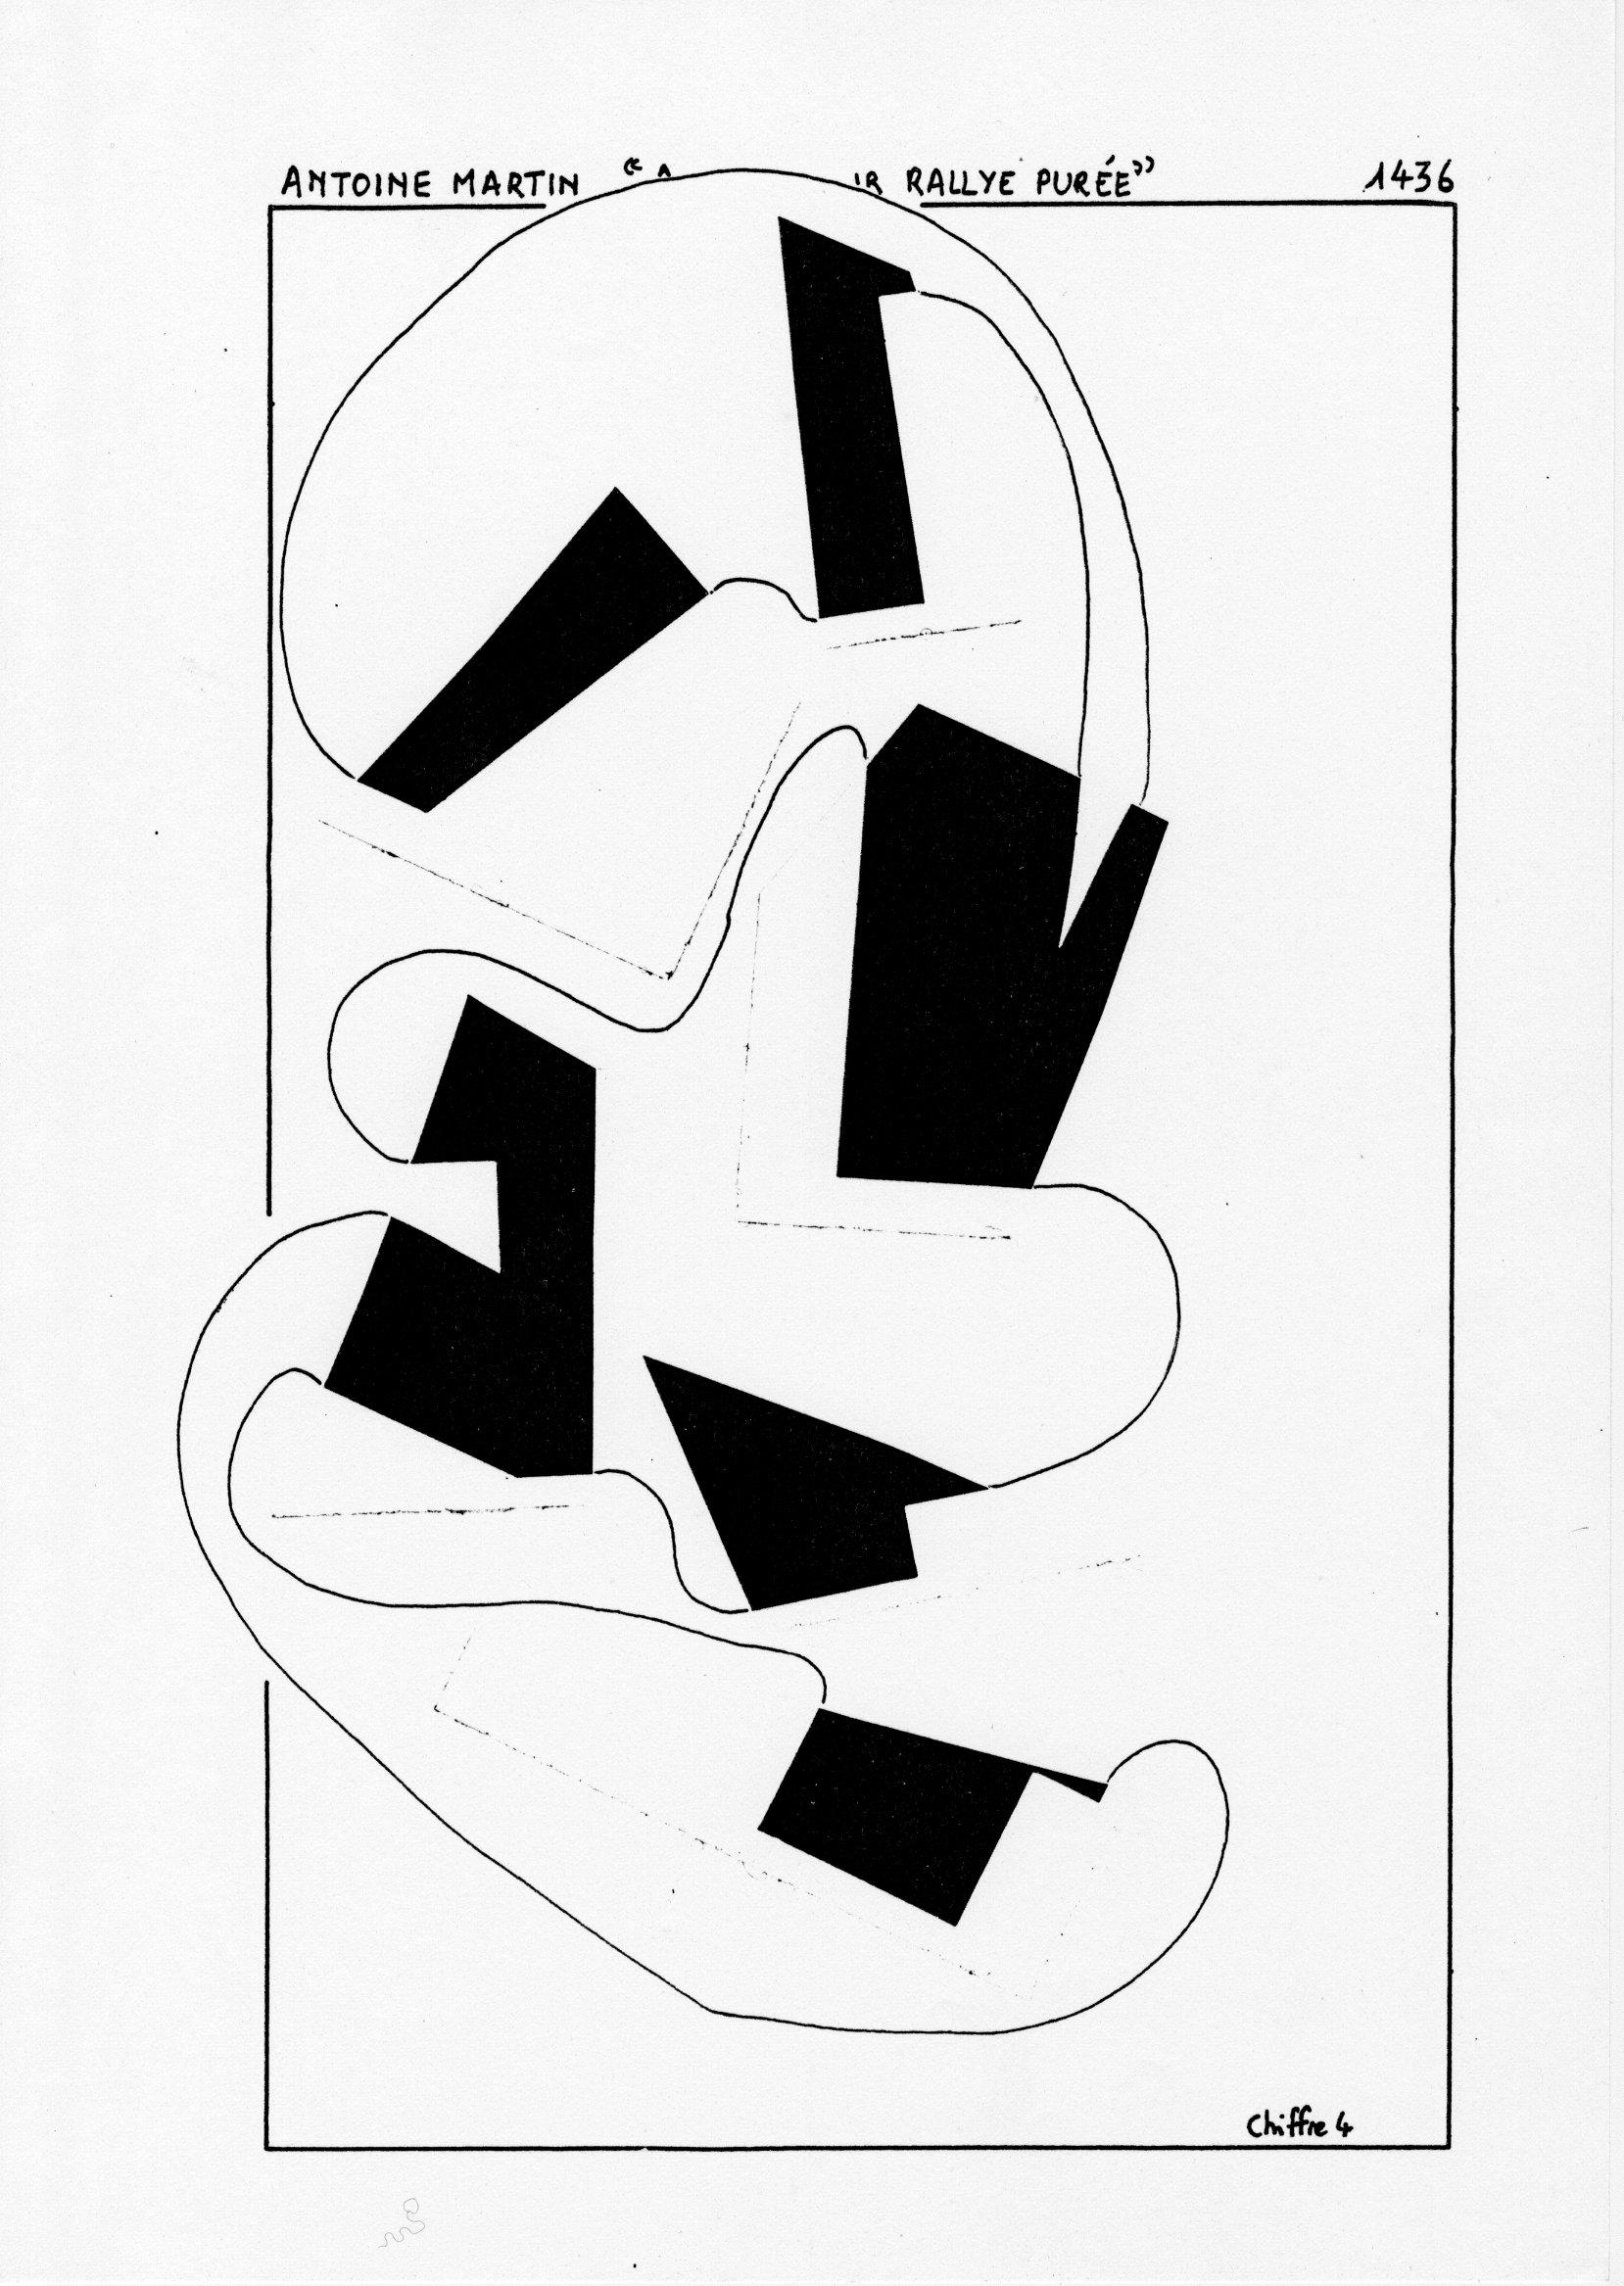 page 1436 A. Martin ADIEU DU SOIR RALLYE PUREE